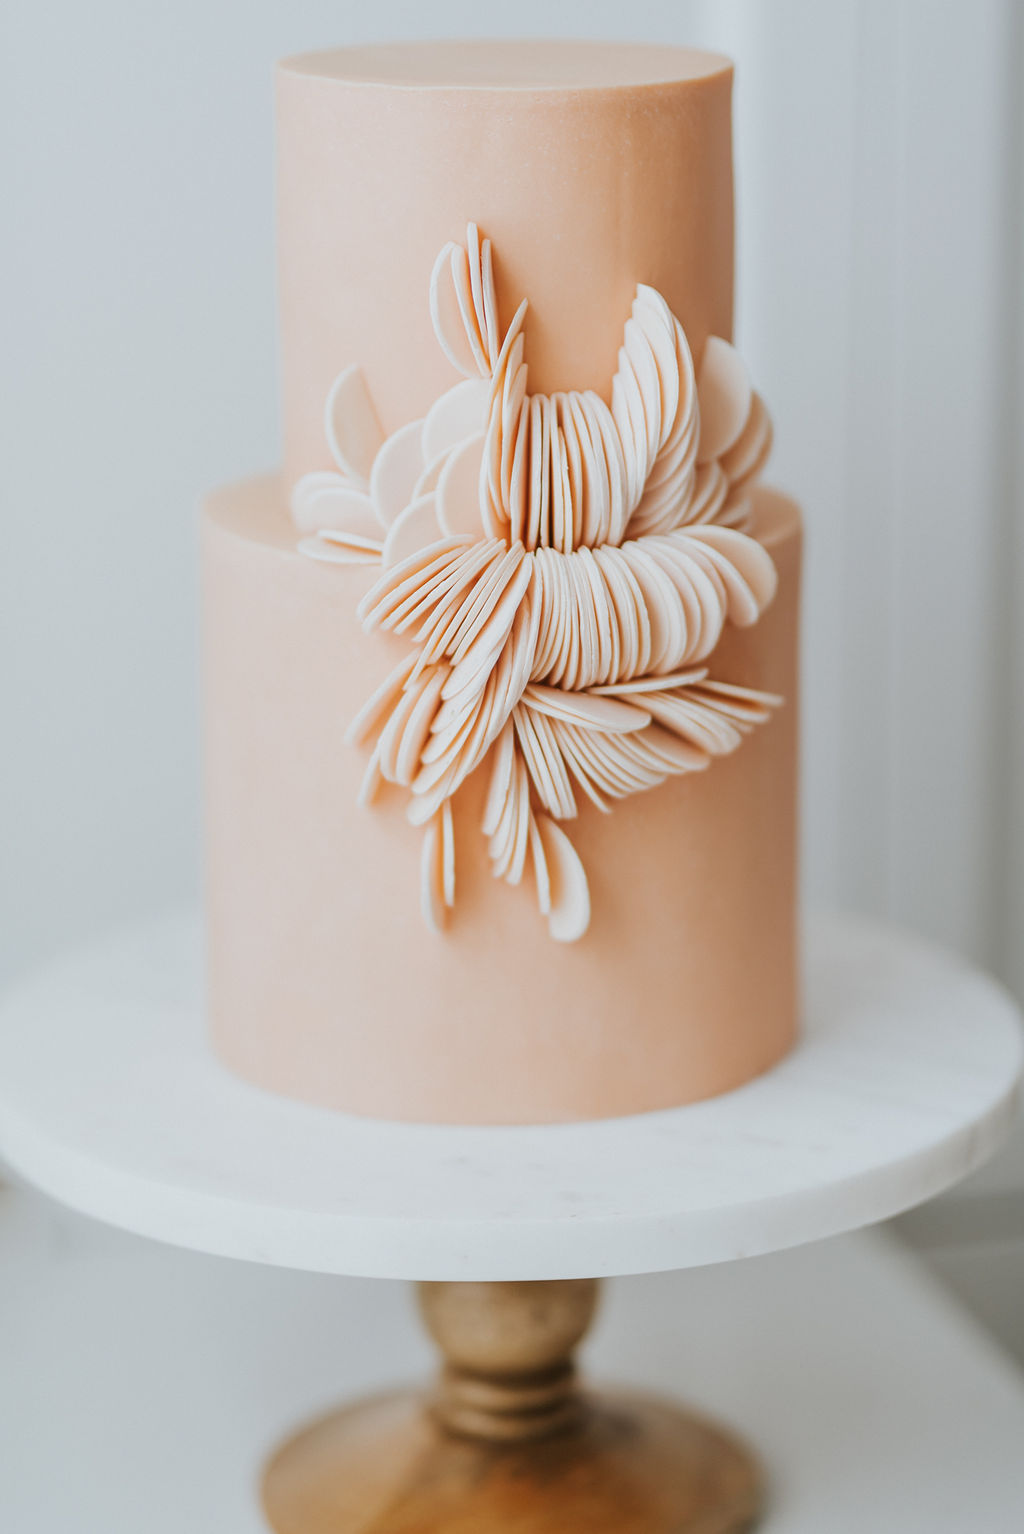 montreal_wedding_designer_cake_coral_cupkateandco.jpg